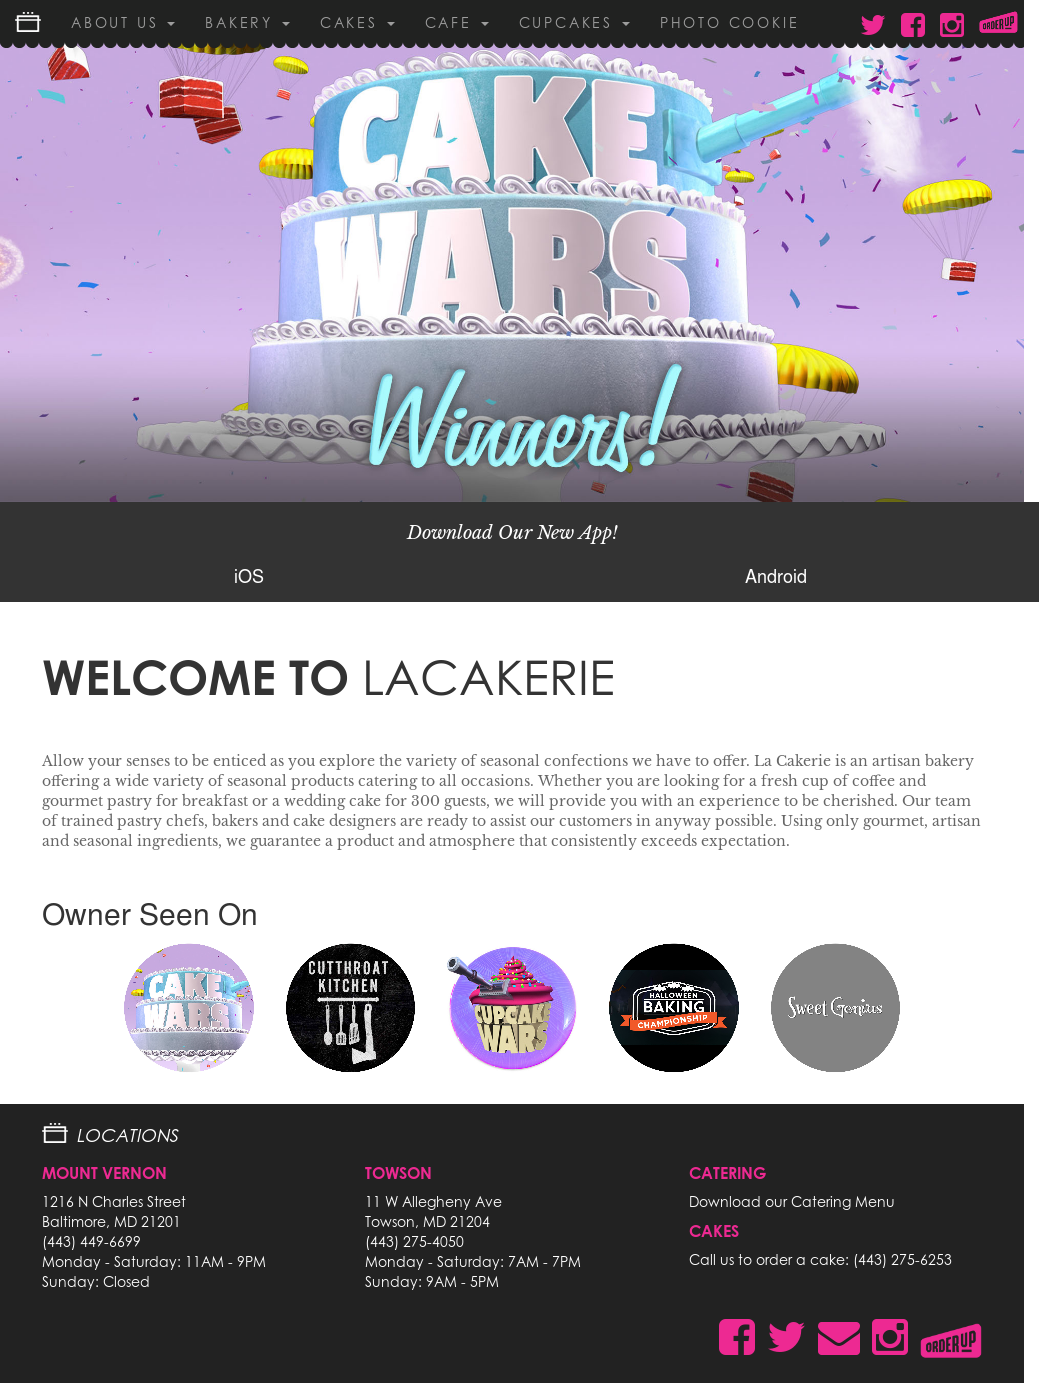 La Cakerie Competitors, Revenue and Employees - Owler Company Profile